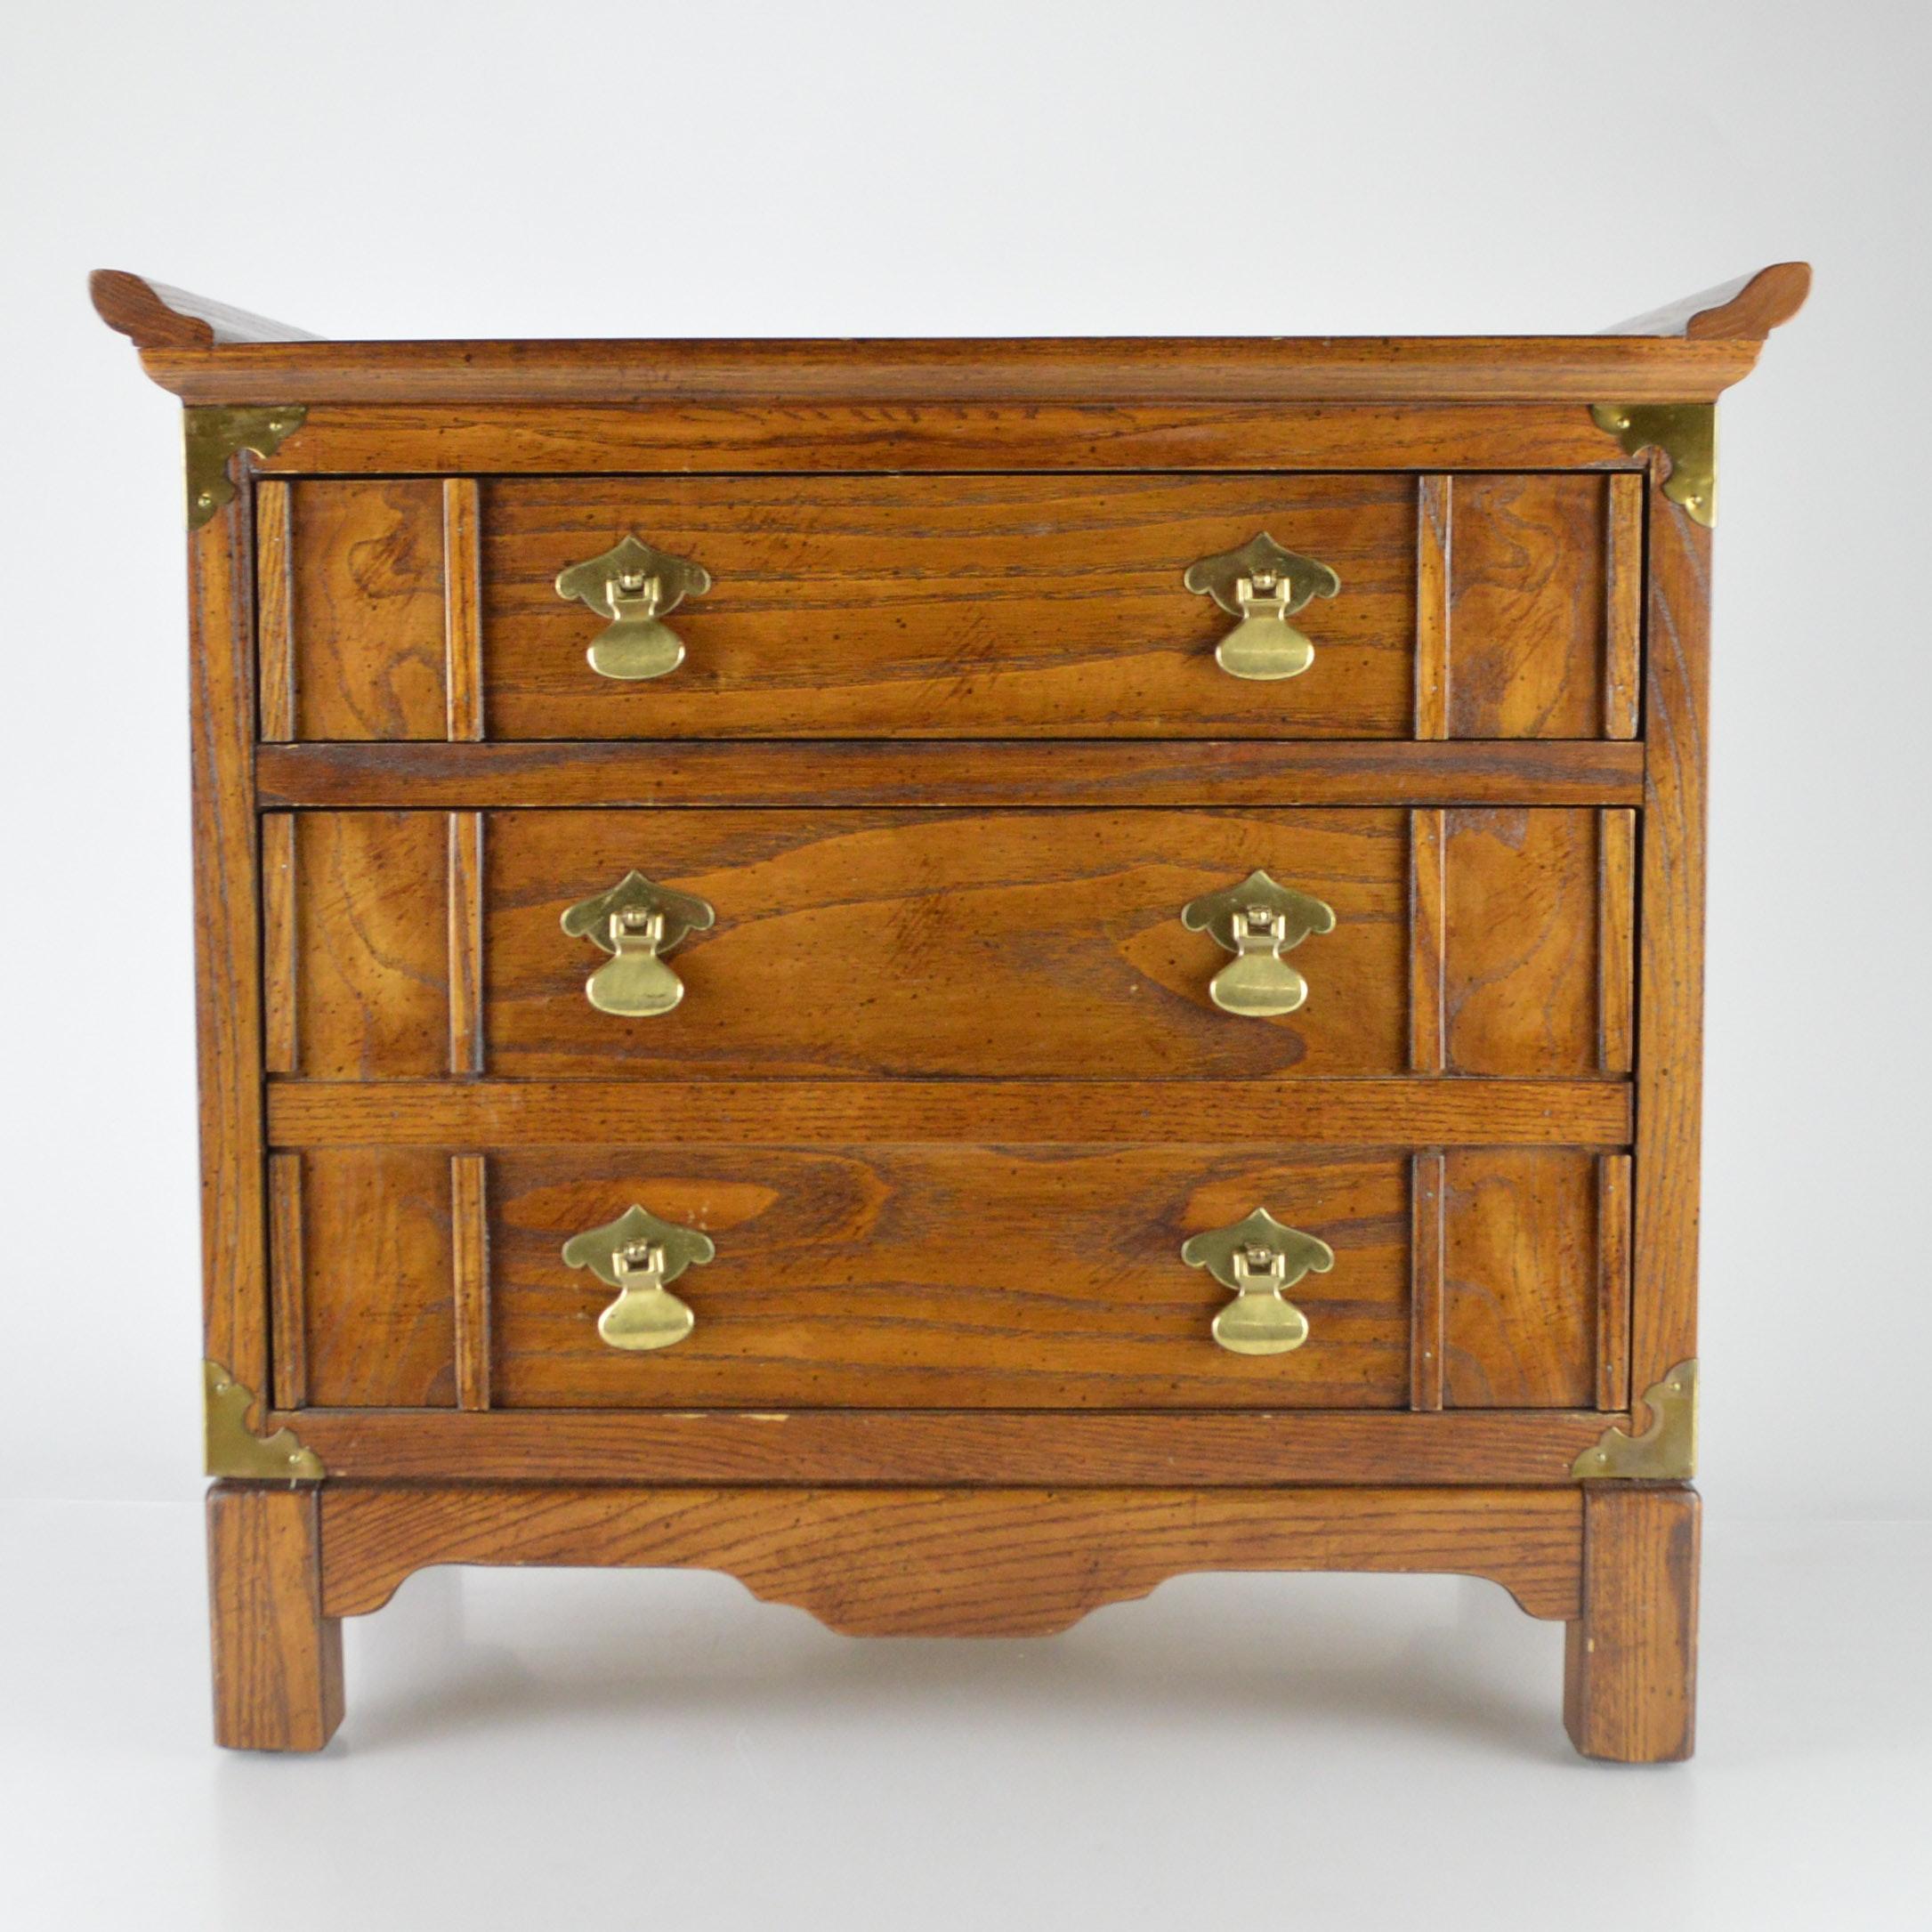 Lane Asian Inspired Oak Tabletop Chest of Drawers